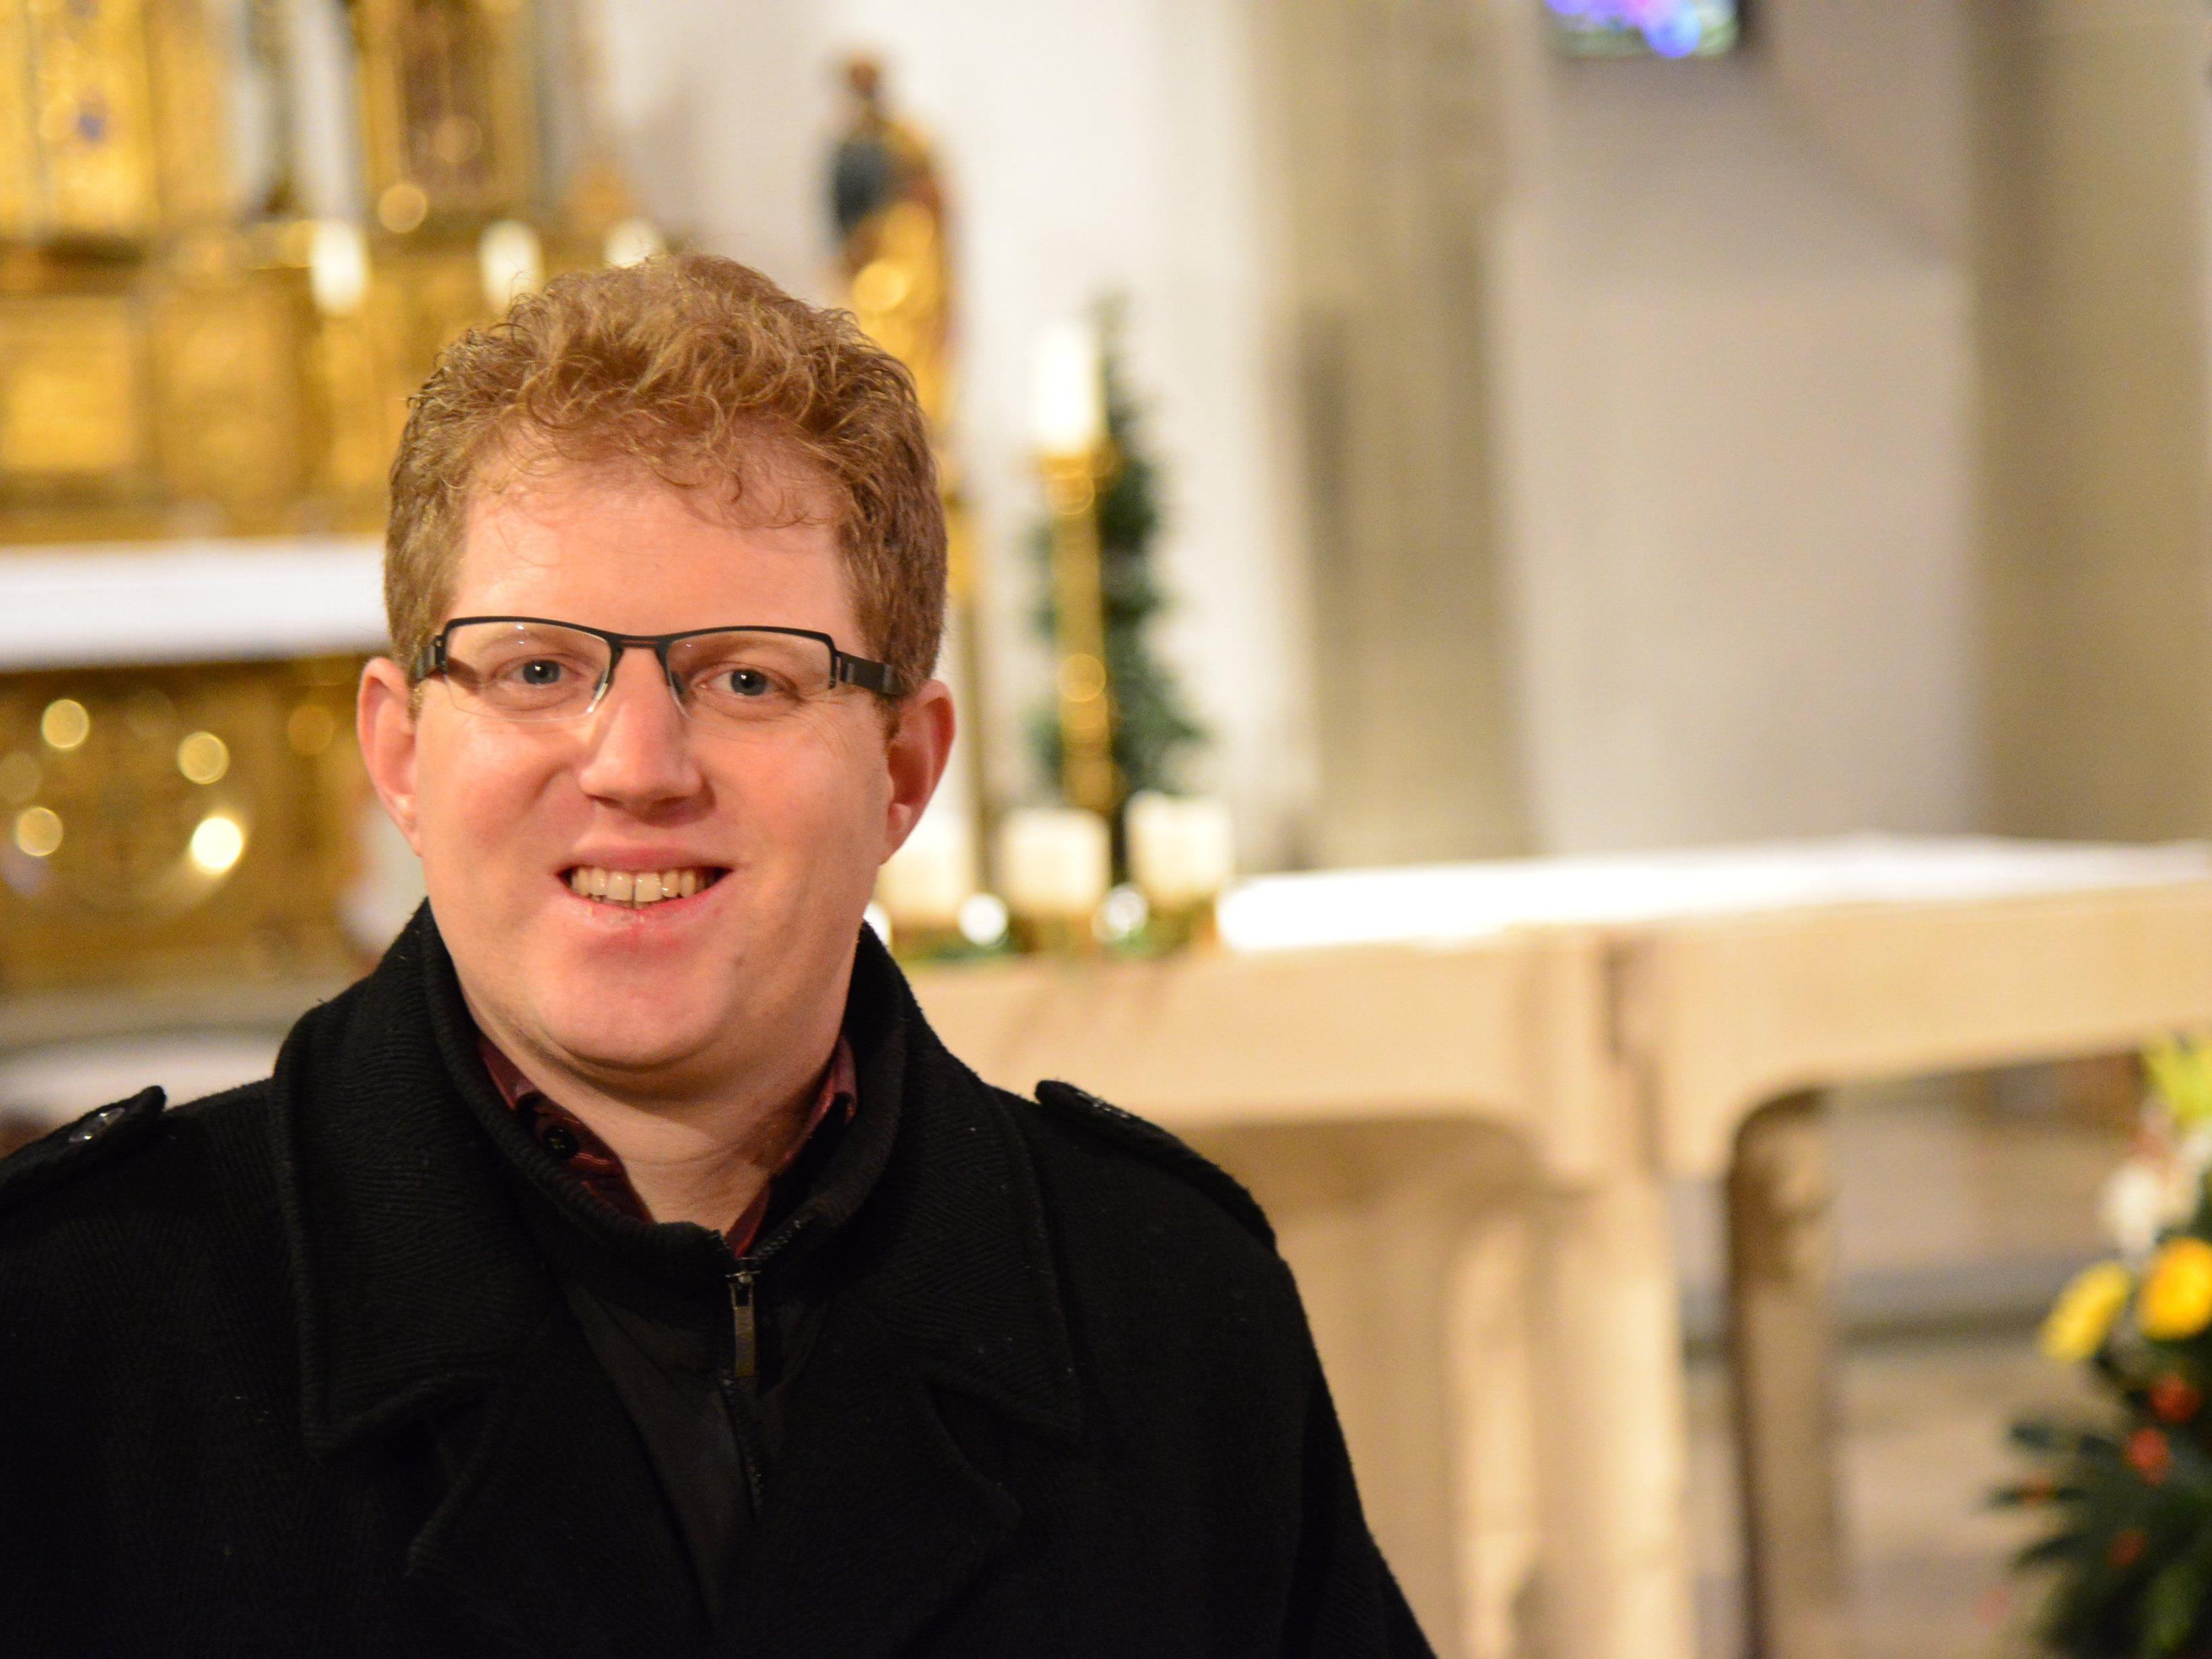 Priesterweihe Fabian Jochum am Samstag, 23. November, 9.30 Uhr, Dom St. Nikolaus, Feldkirch.